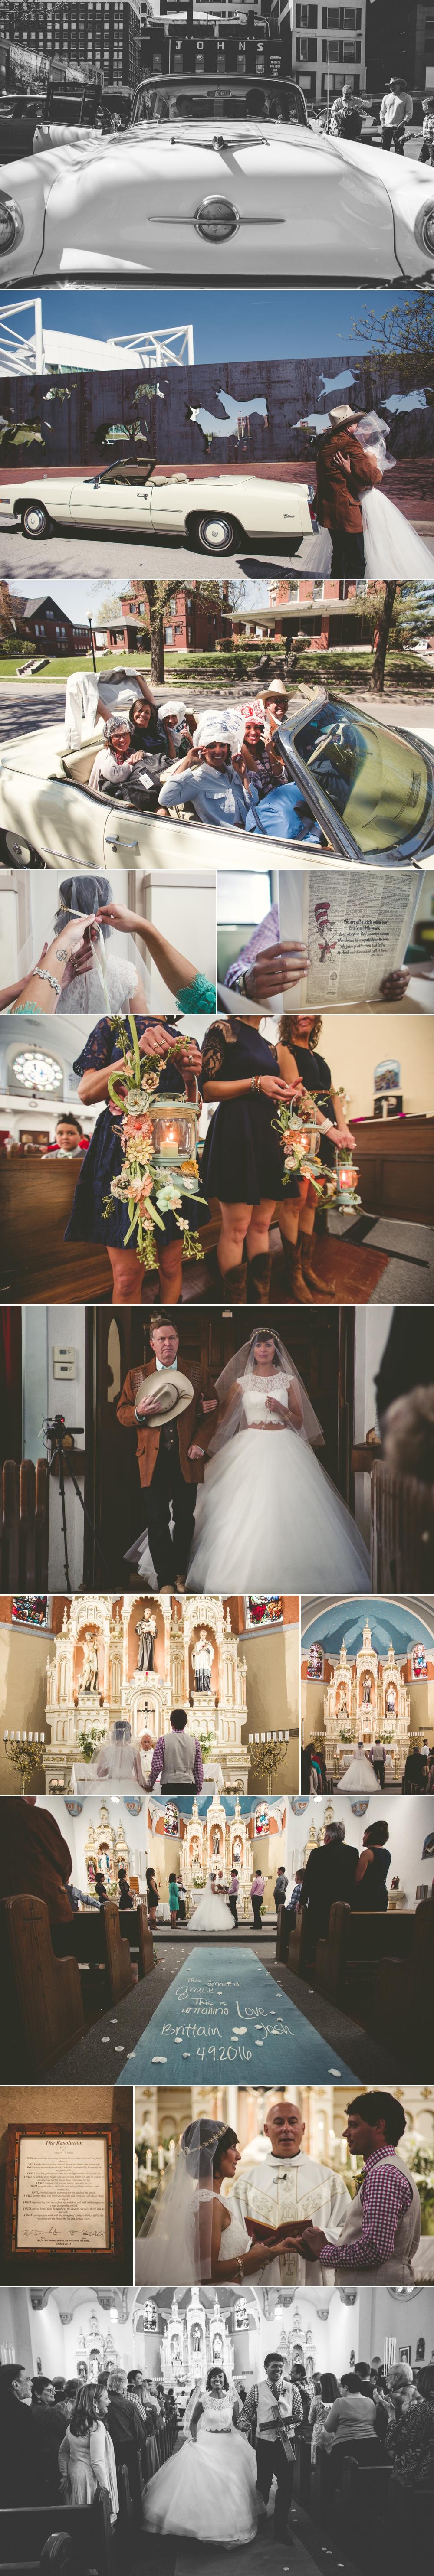 jason_domingues_photography_best_wedding_photographer_kansas_city_kc_downtown_historic_northeast_city_country_farm_diy_creative_details_2